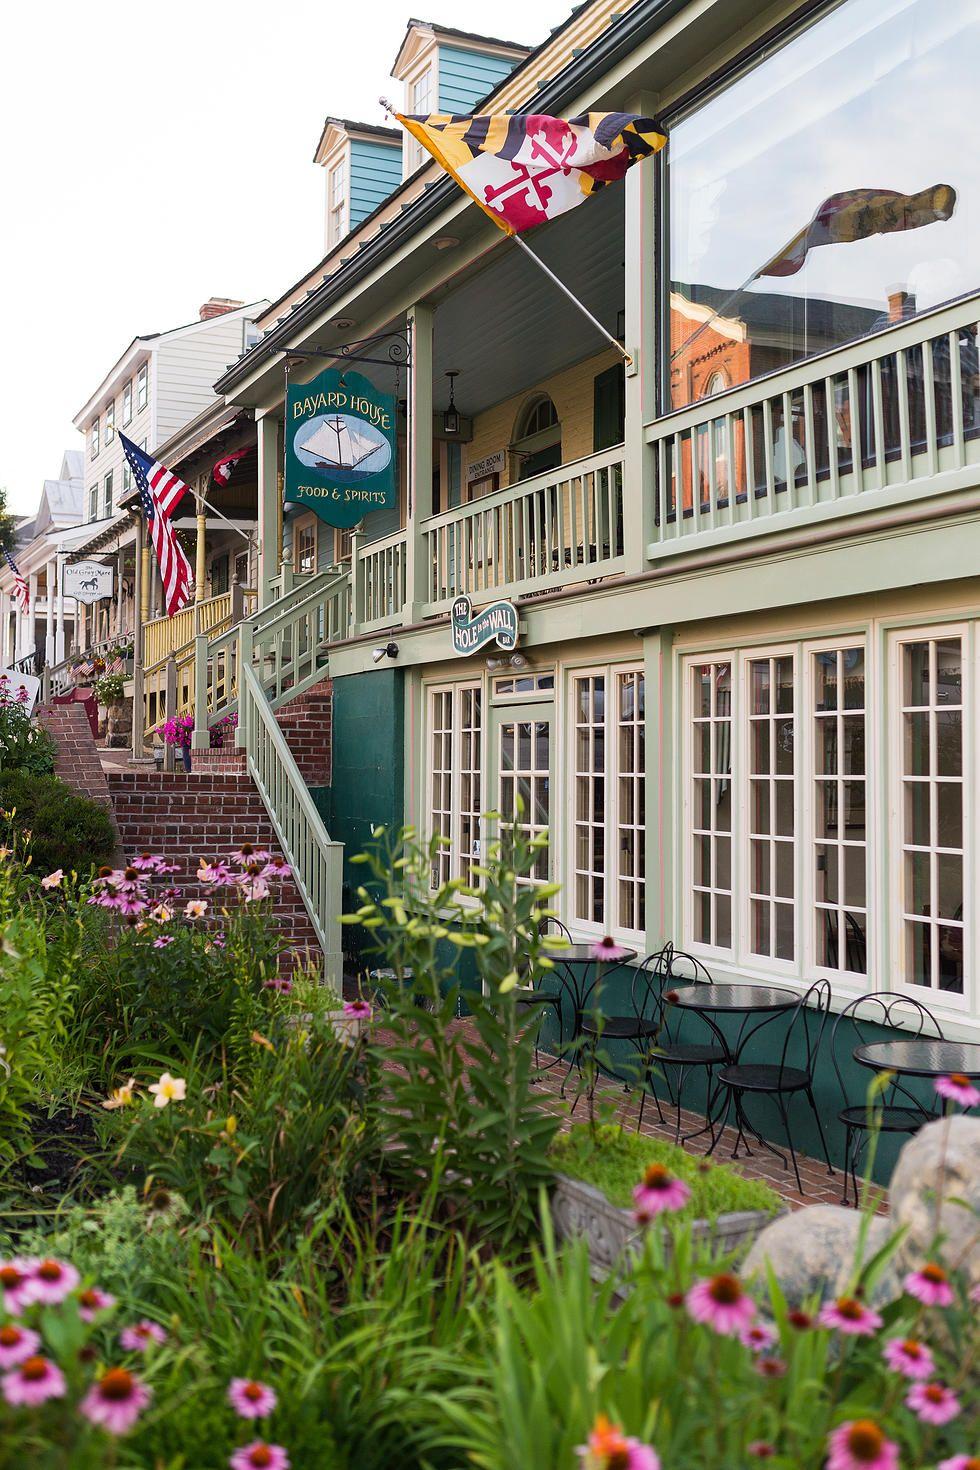 Bayard Housem Resturant Chesapeake City Vacation Restaurants Pretty Places